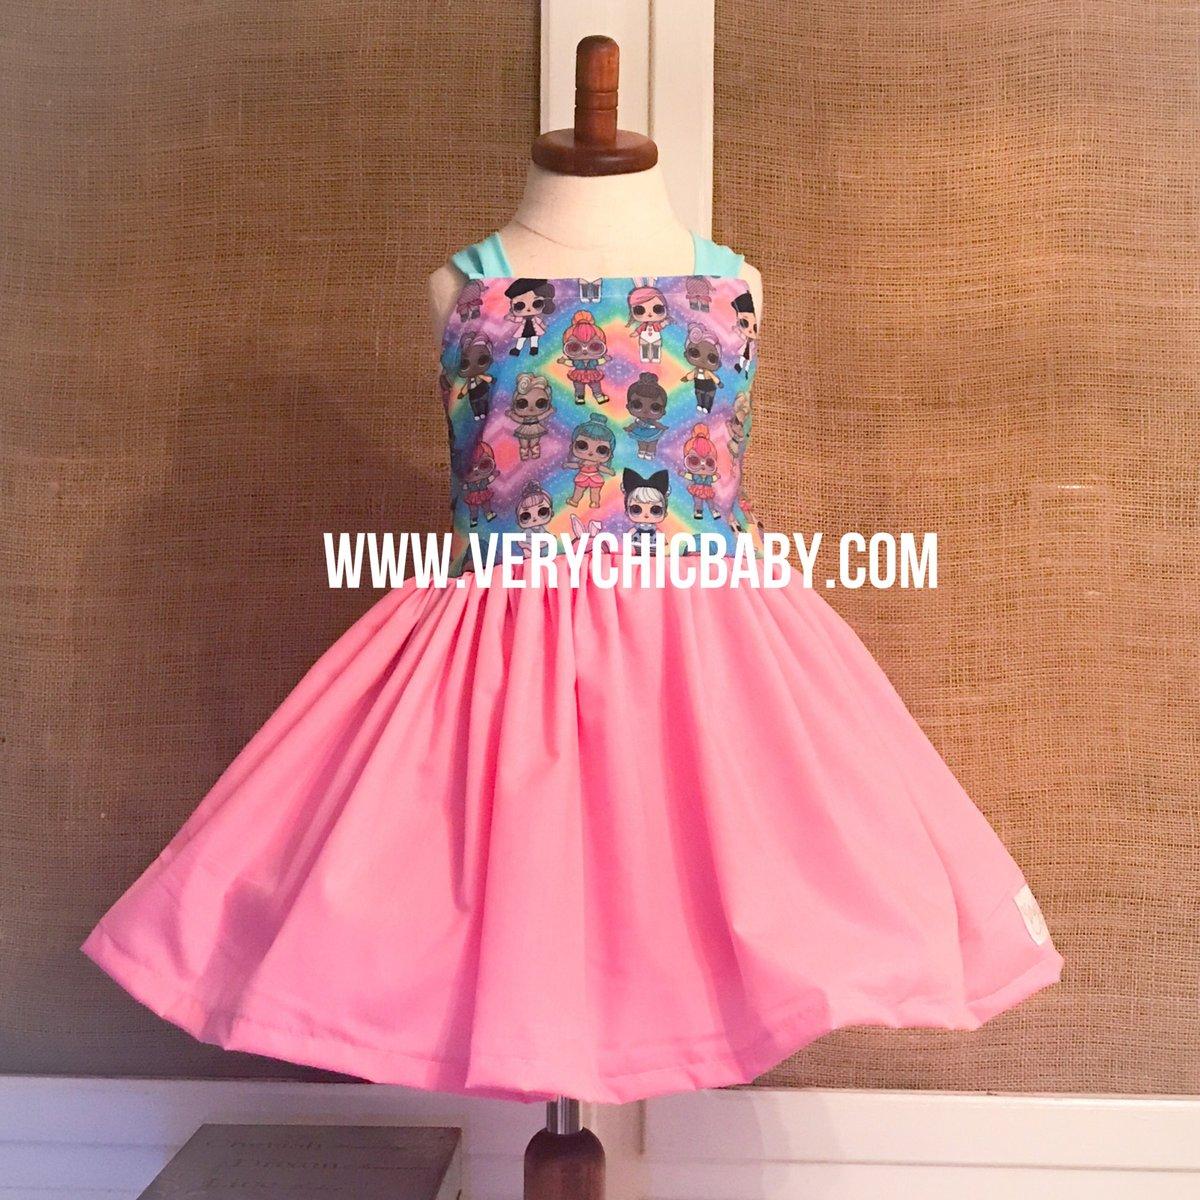 Image of LOL Surprise Doll Dress